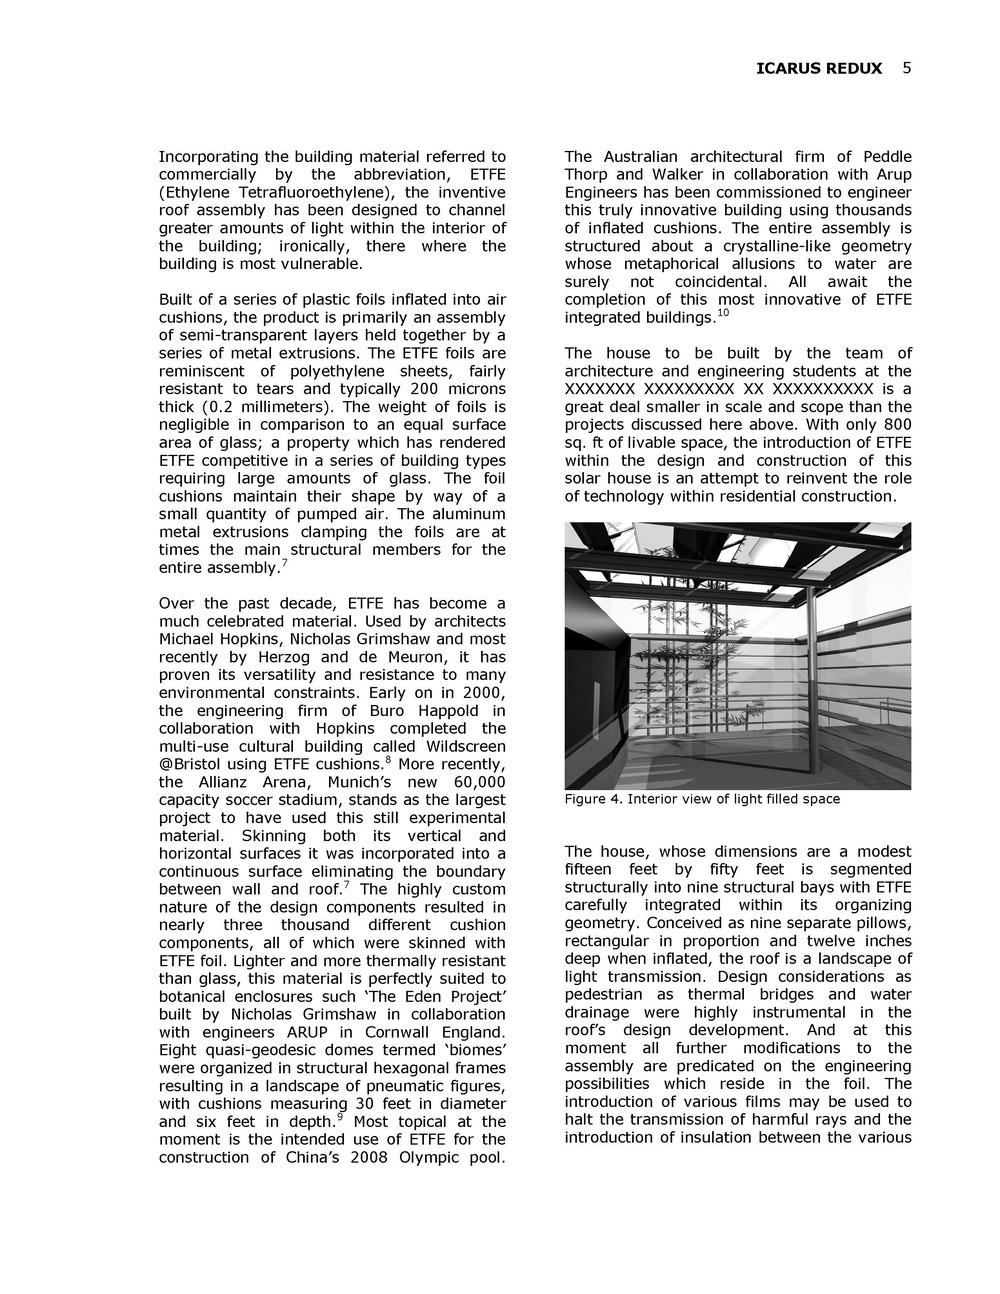 ACSA.2007.IcarusRedux2_Page_5.jpg